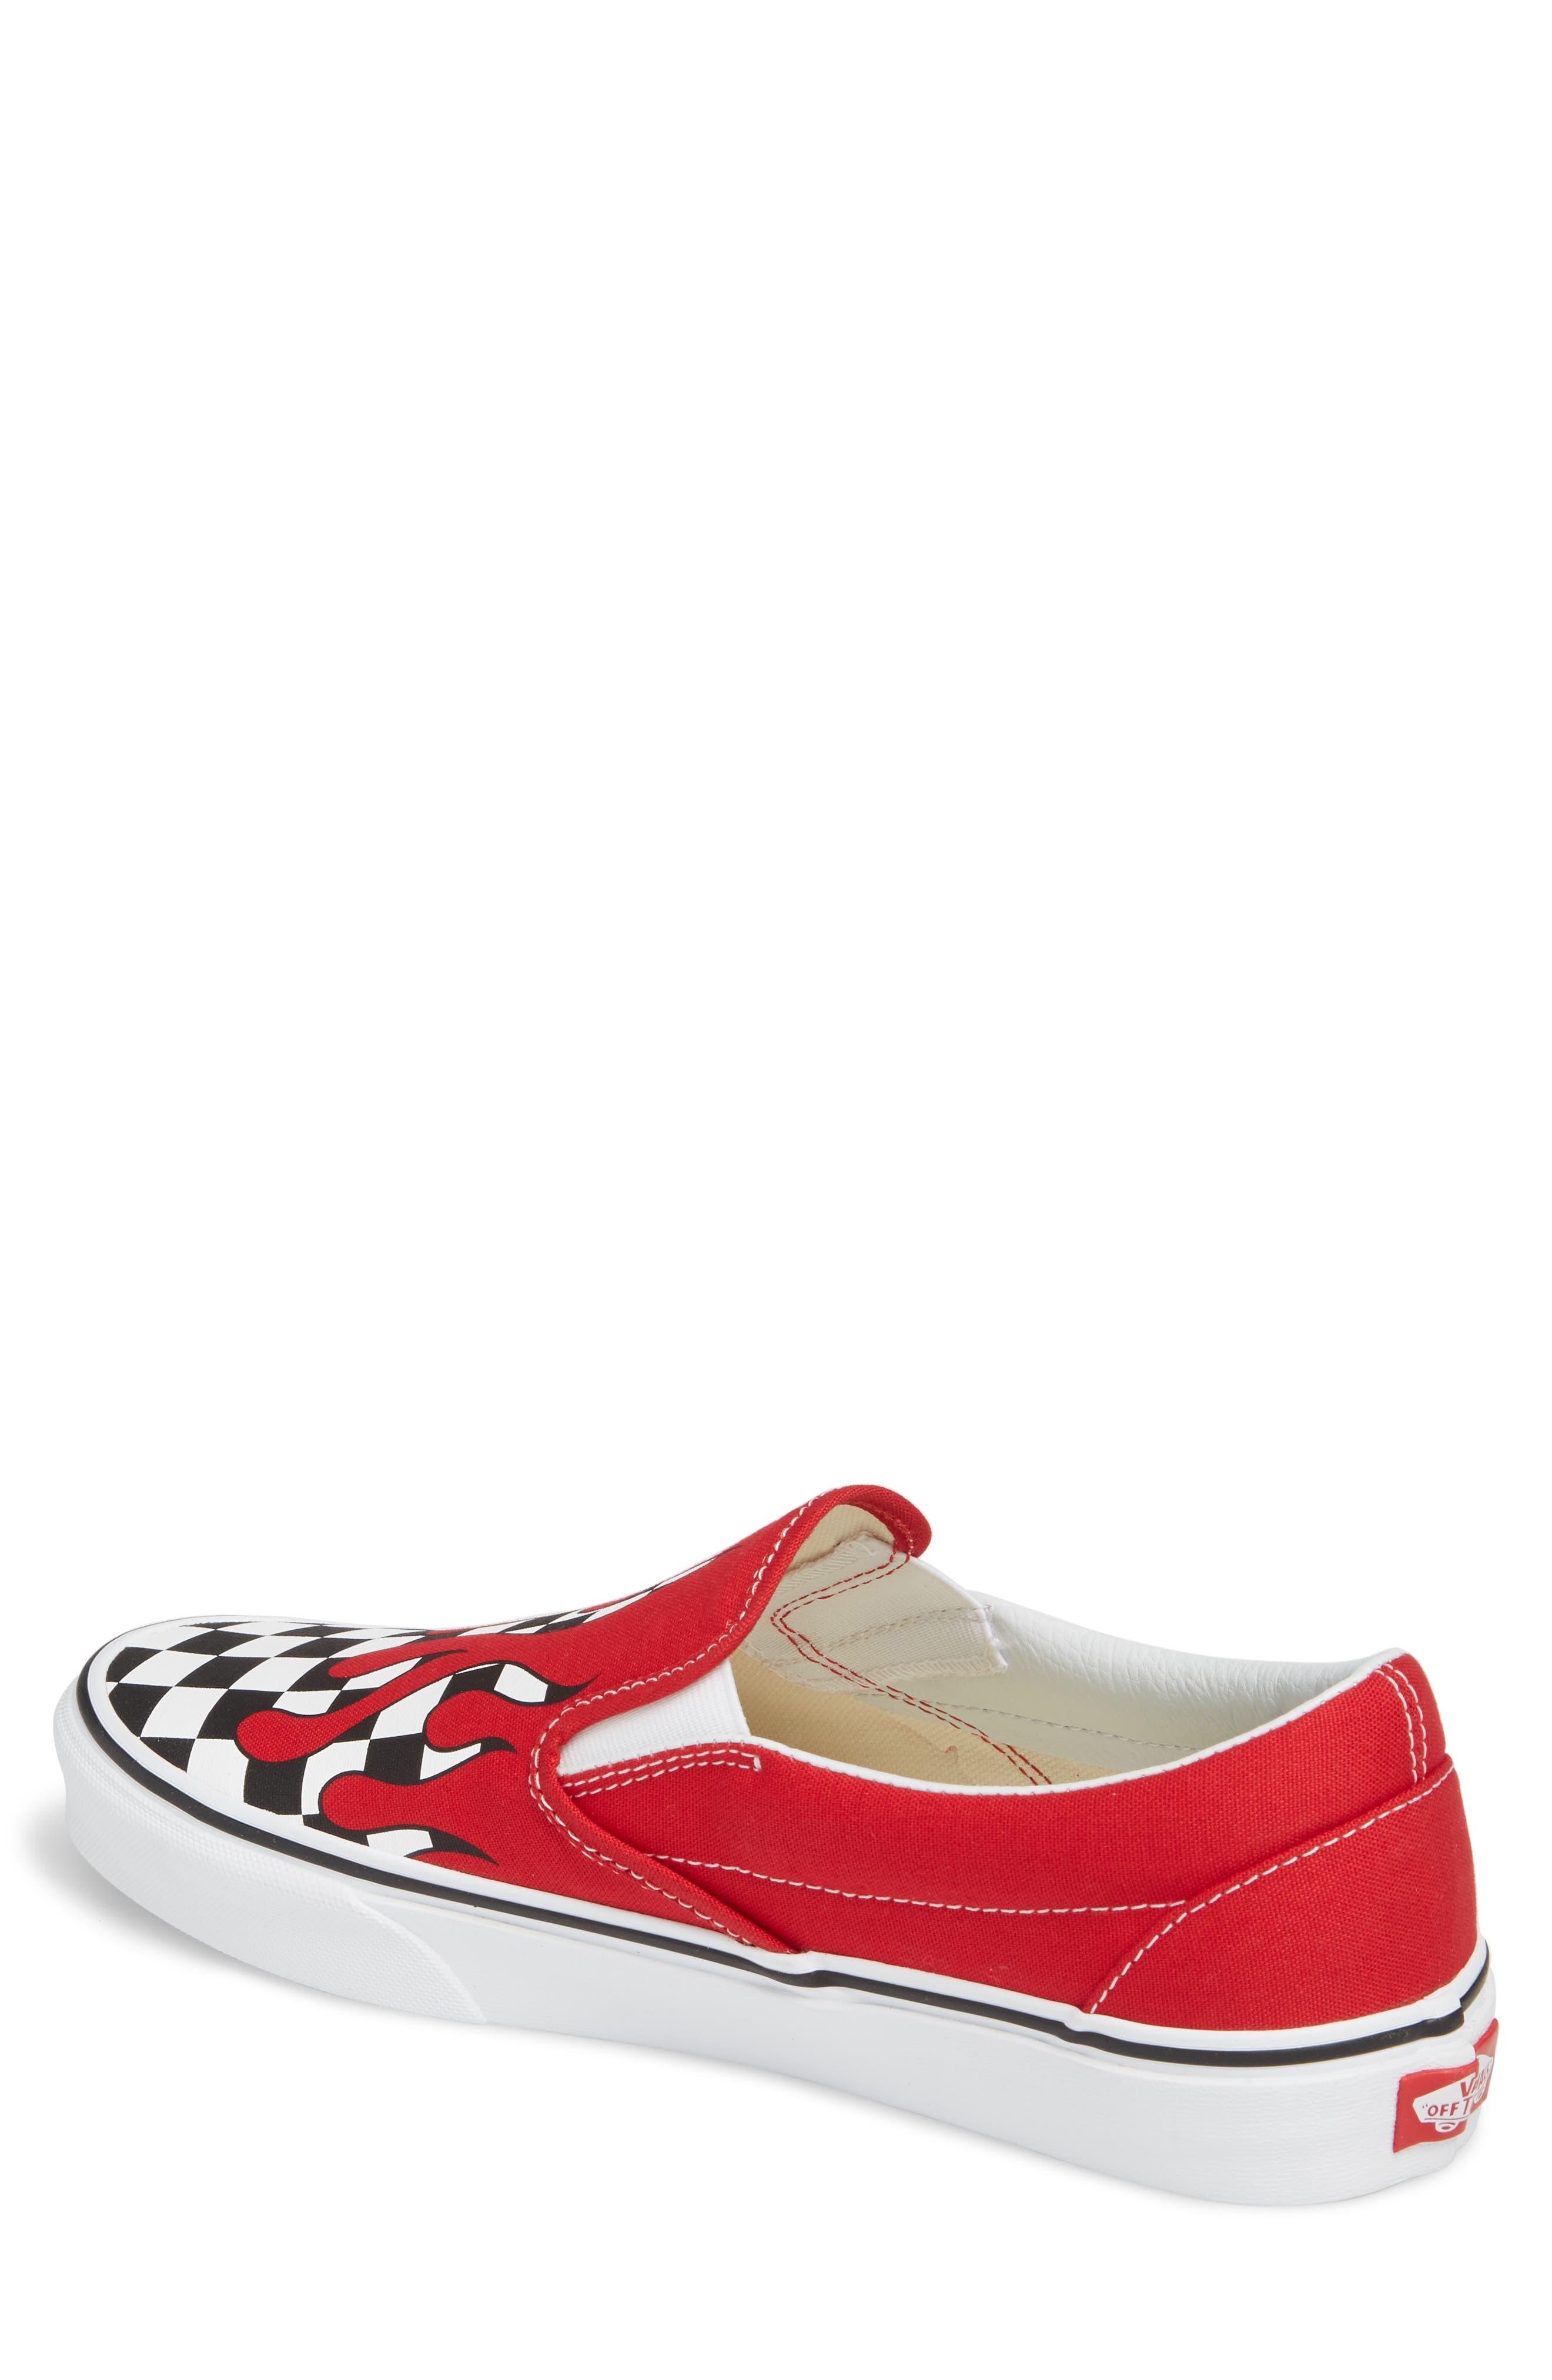 UA Classic Slip-On Sneaker,                             Alternate thumbnail 2, color,                             Racing Red/ White Checker